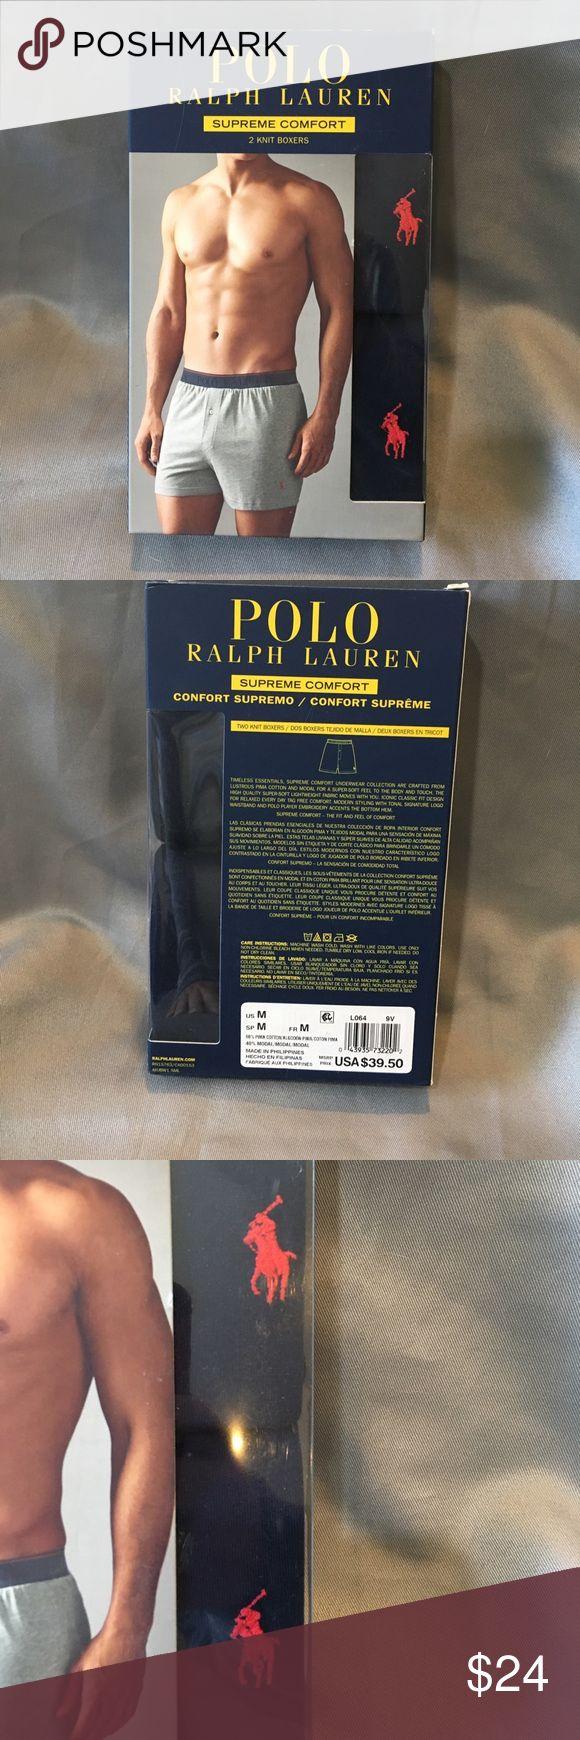 NWT POLO Ralph Lauren 2 Pk Knit Boxers NWT POLO Ralph Lauren 2 Pk Knit Boxers. Supreme comfort. Polo by Ralph Lauren Underwear & Socks Boxers